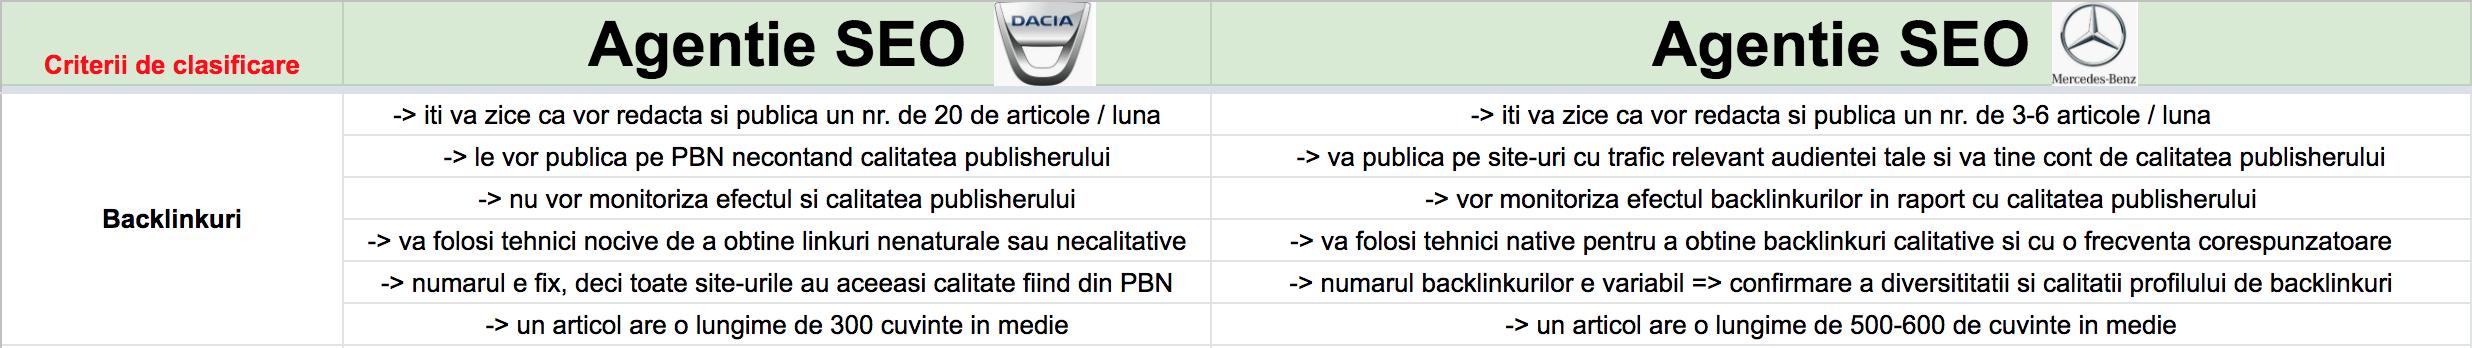 Agentie SEO - clasificare dupa backlinks